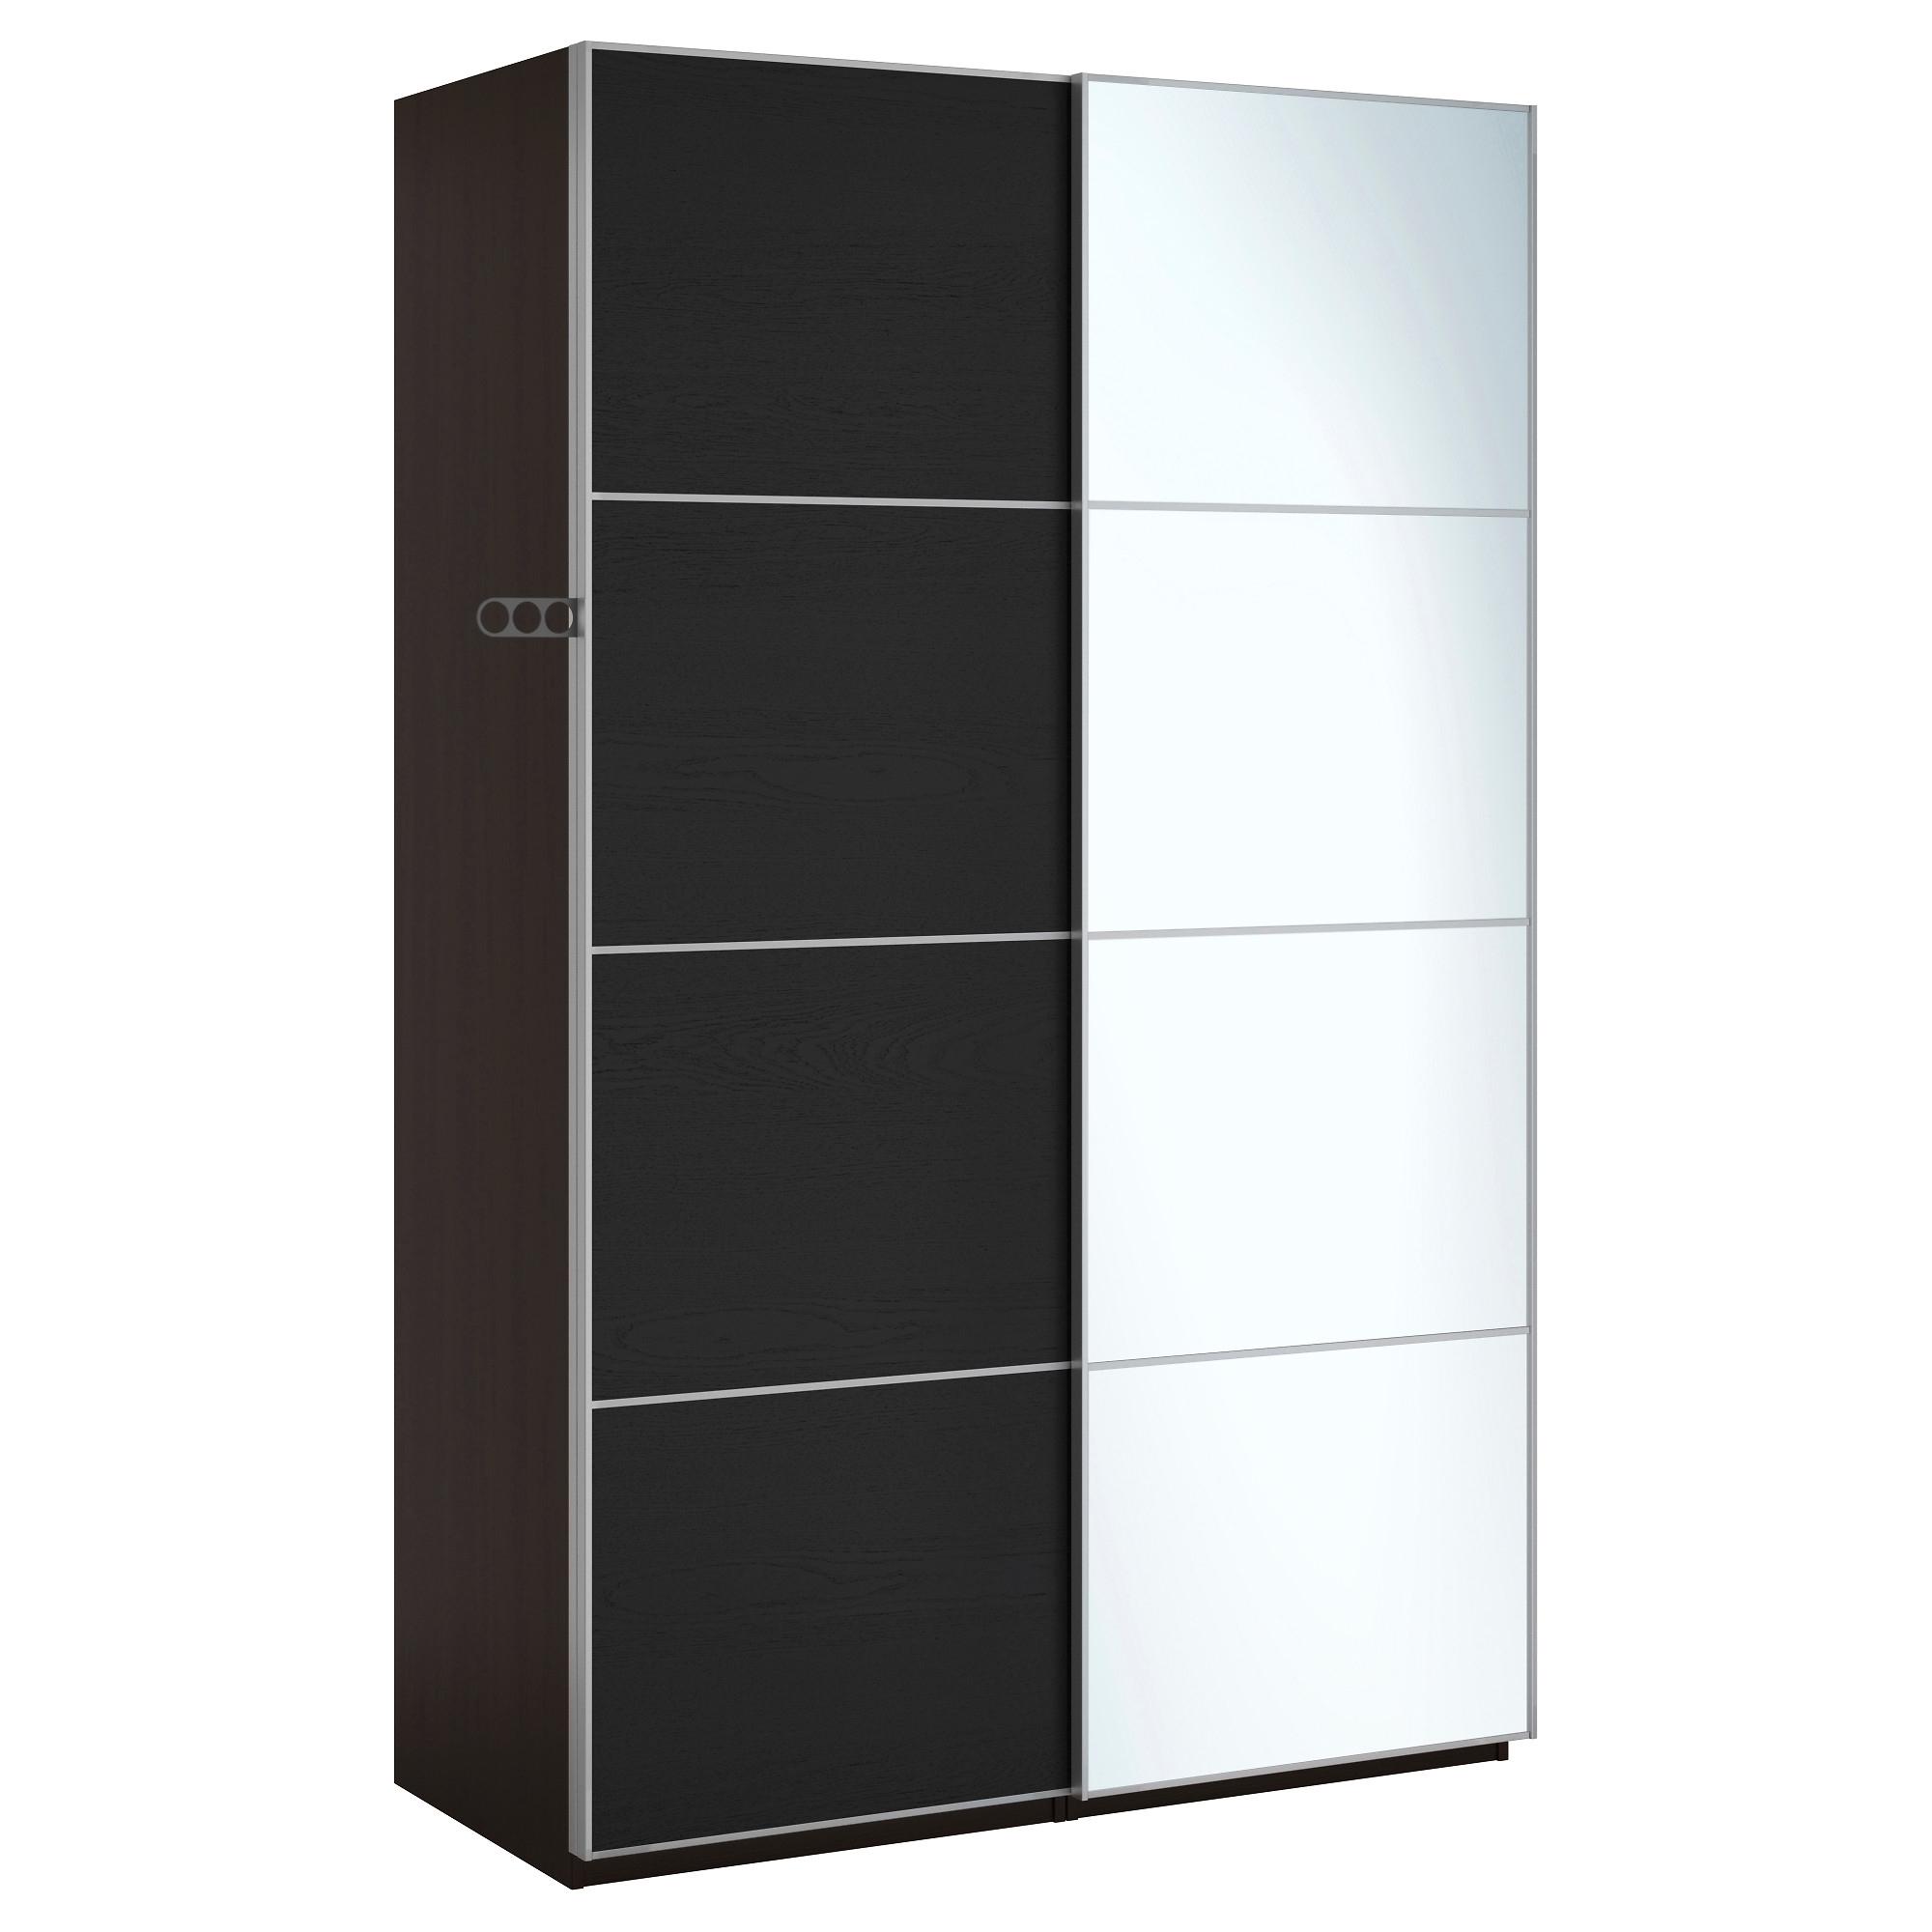 Chest Of Drawers Wardrobes Combination Regarding 2018 Pax Wardrobe – 150x66x201 Cm, Soft Closing Damper – Ikea (View 12 of 15)